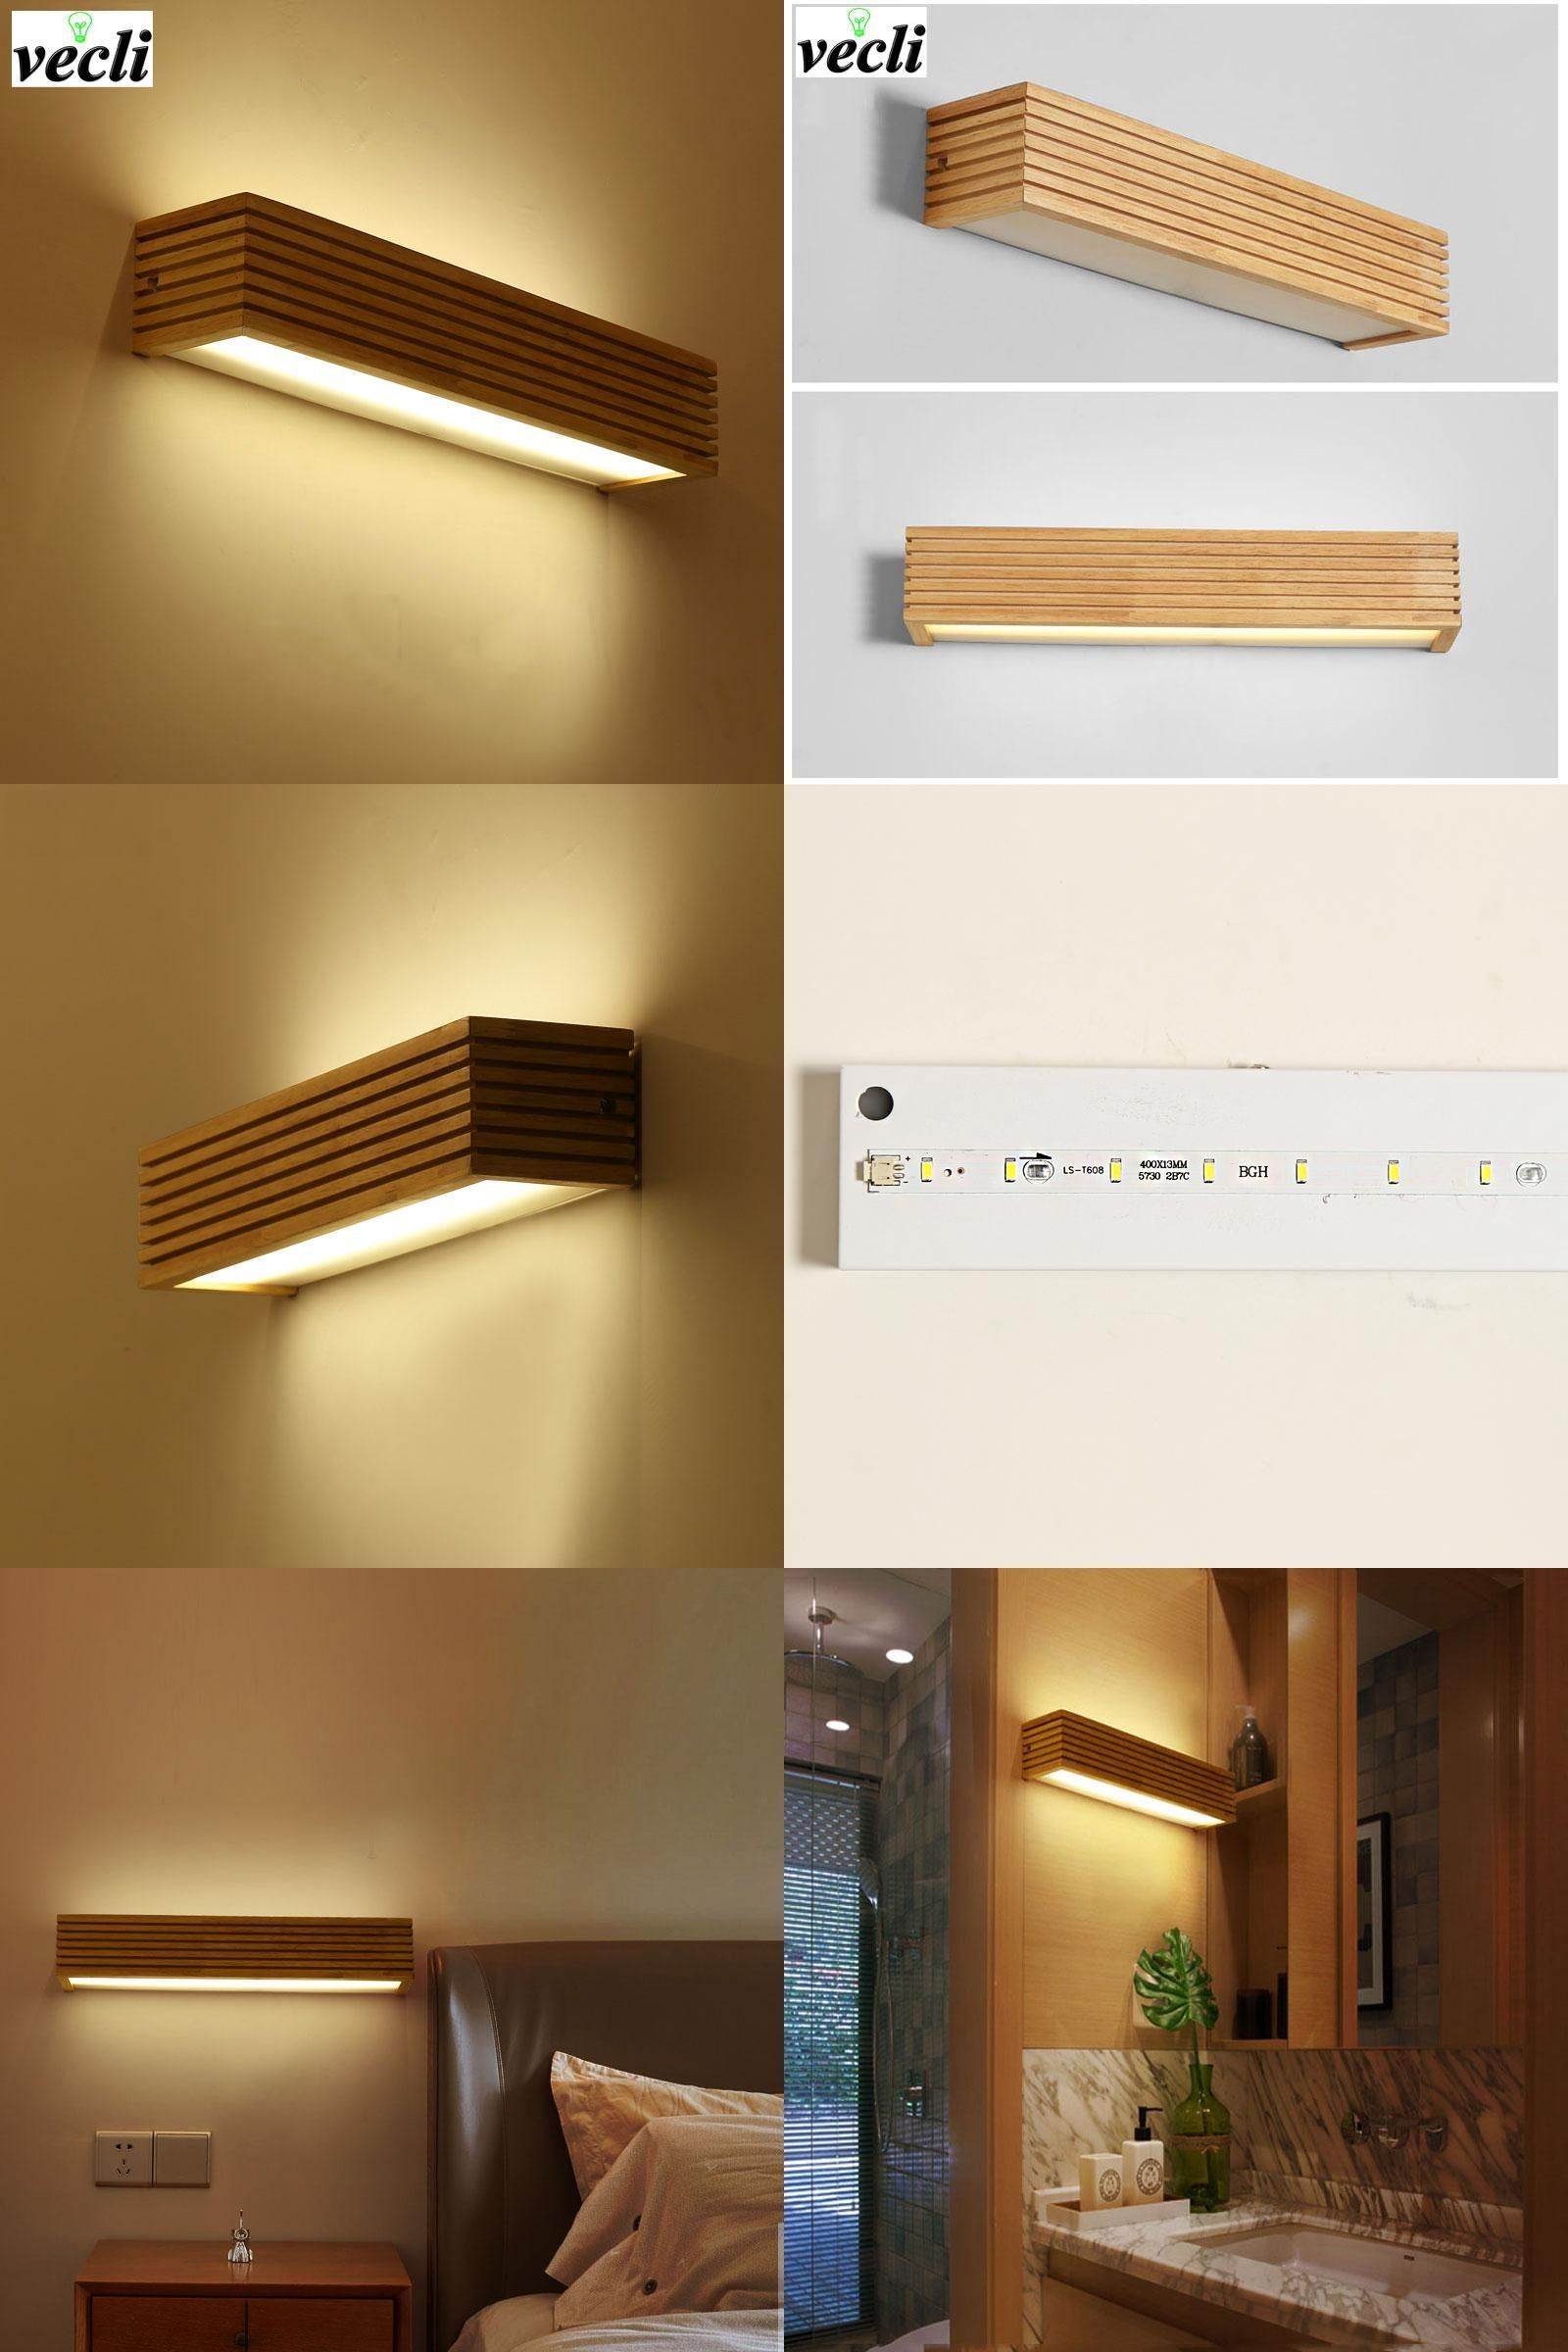 Bedroom Sconce Light Fixtures Wall Sconces Bedroom Wall Lamp